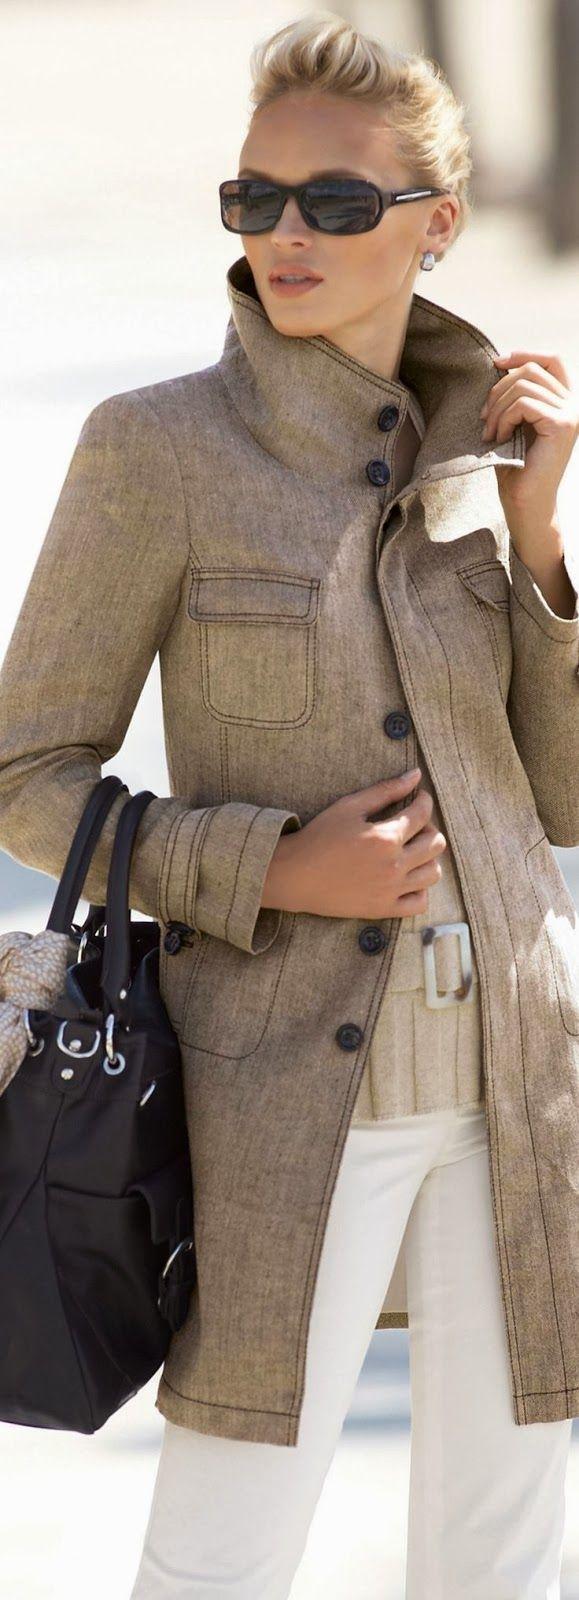 1199 Best Easy Day Images On Pinterest Coat Storage Dress Long Minimal Cover Up Batwing Top Light Camel Putih Xl Four Pocket Ladies Blazer Click For More